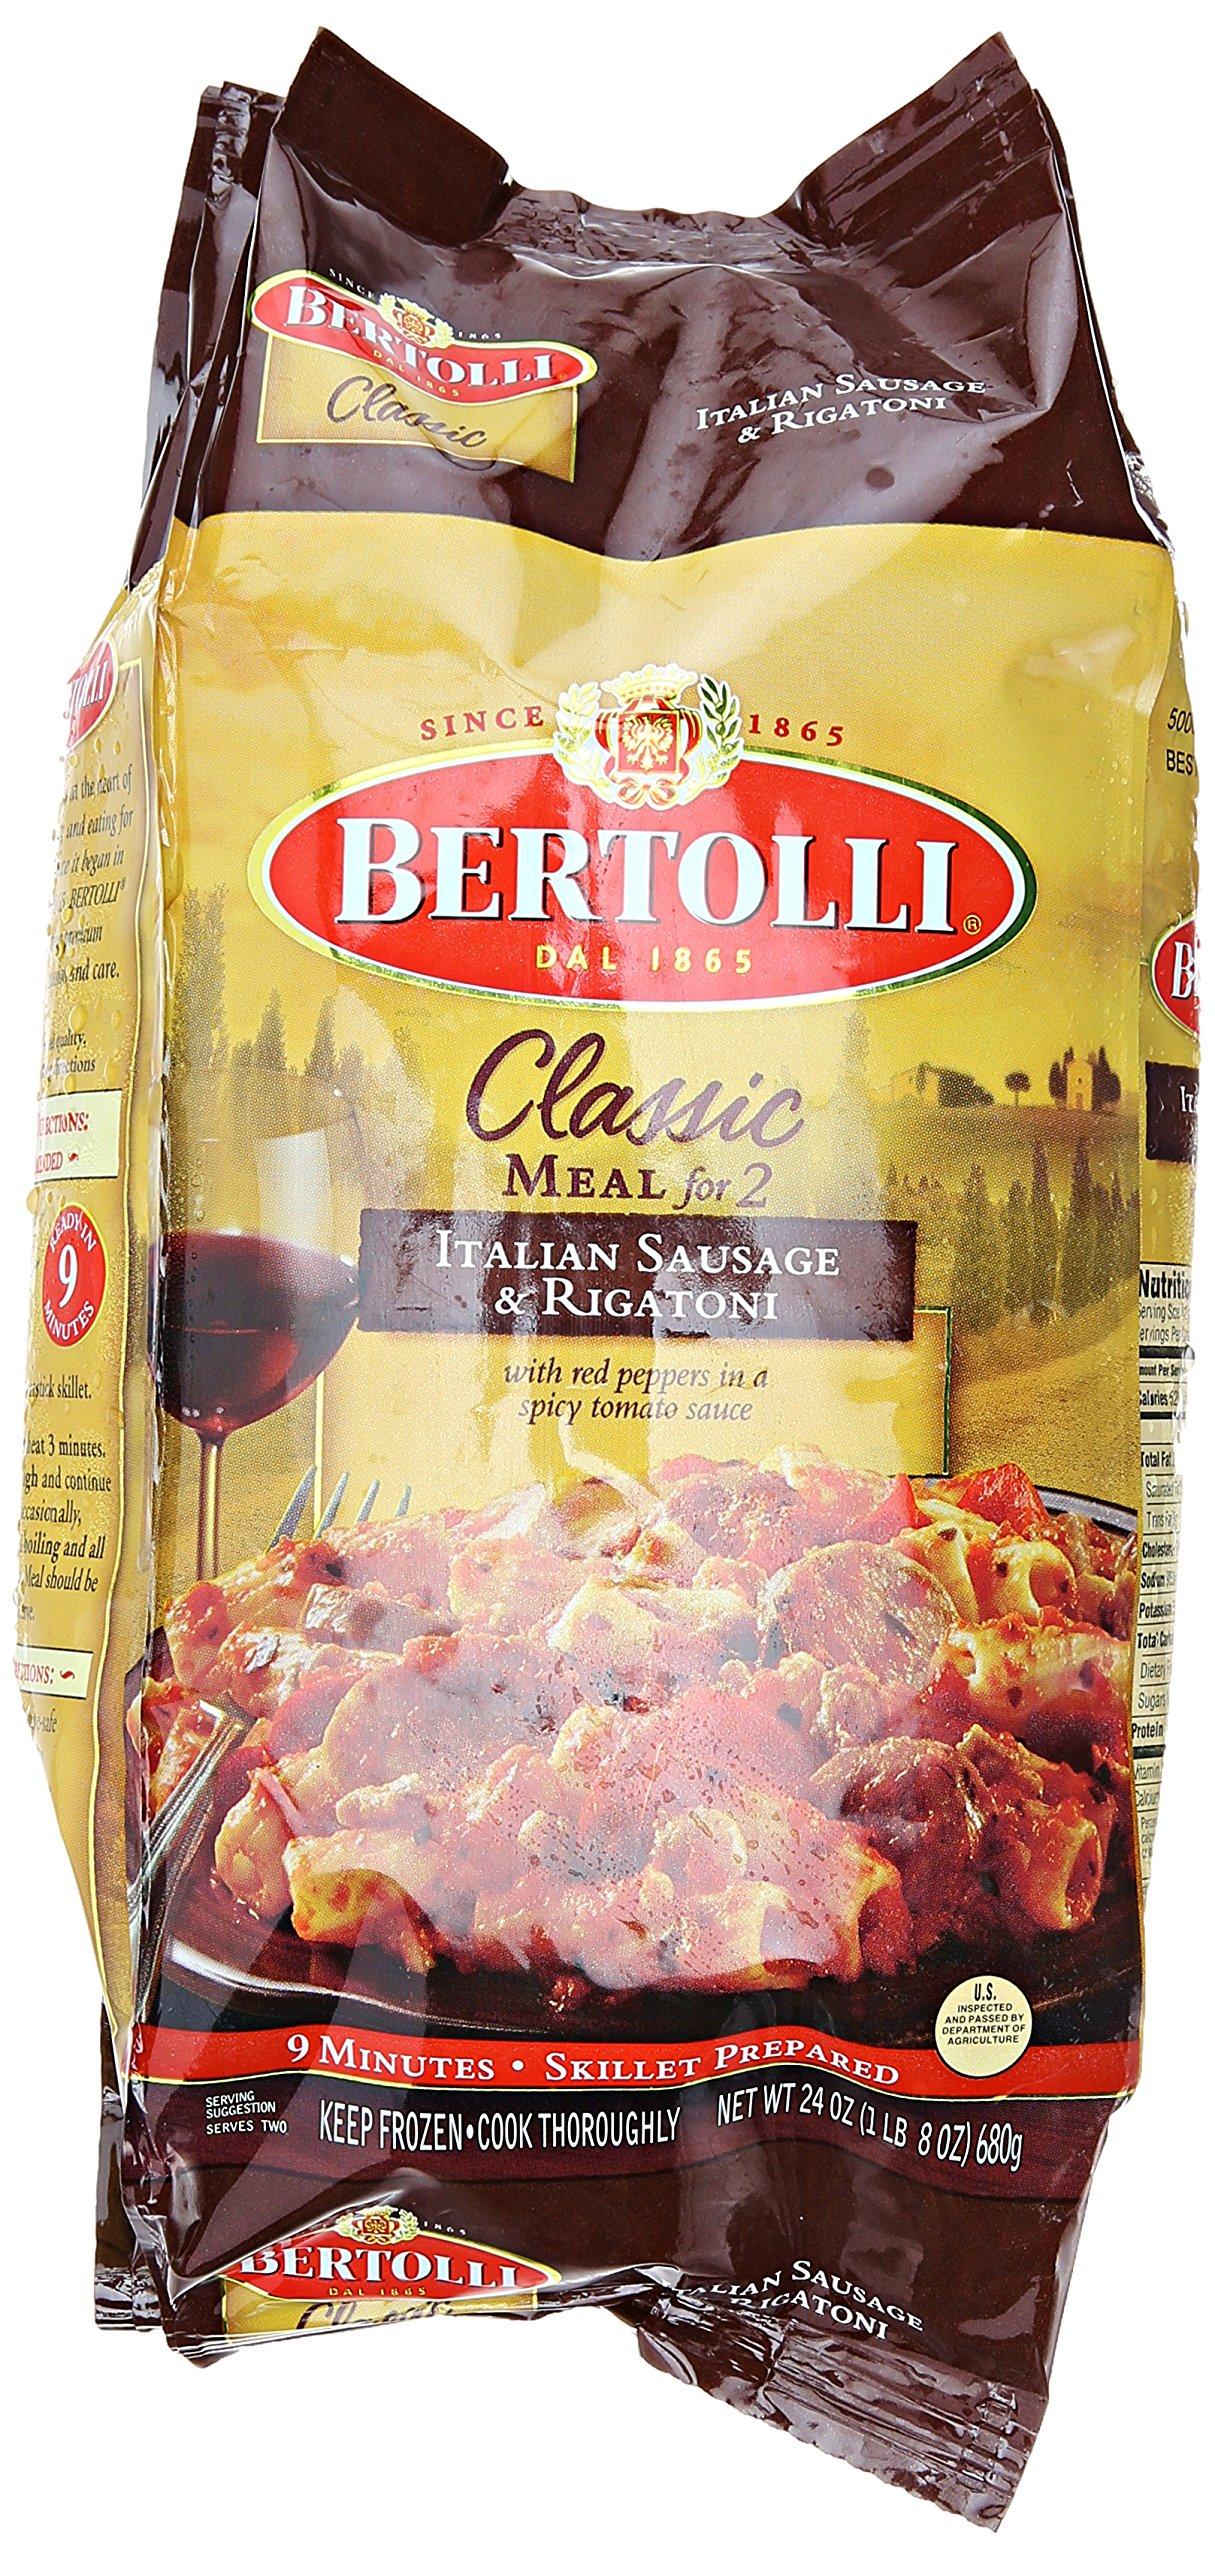 Bertolli Classic Meal for 2 Italian Sausage & Rigatoni, 24 oz